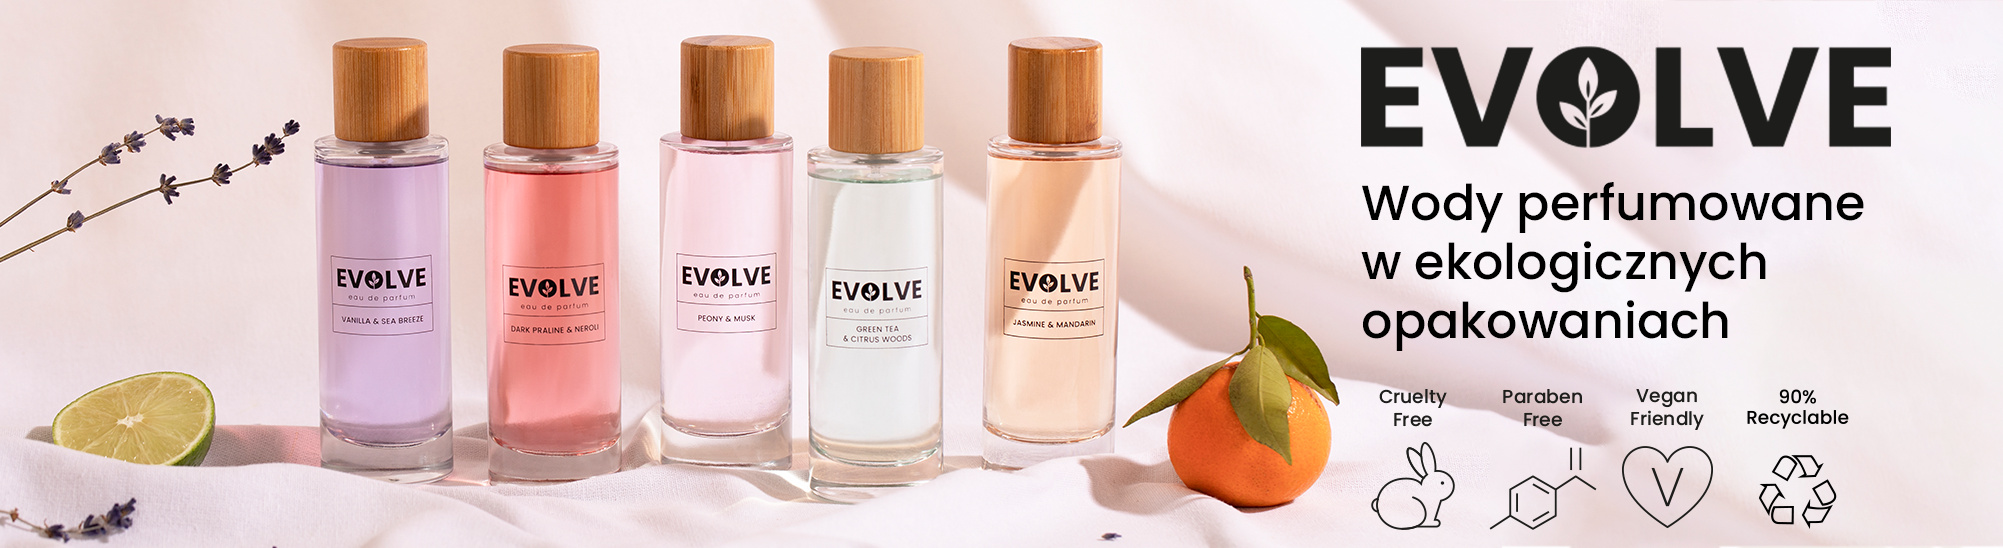 [Evolve - wody perfumowane]